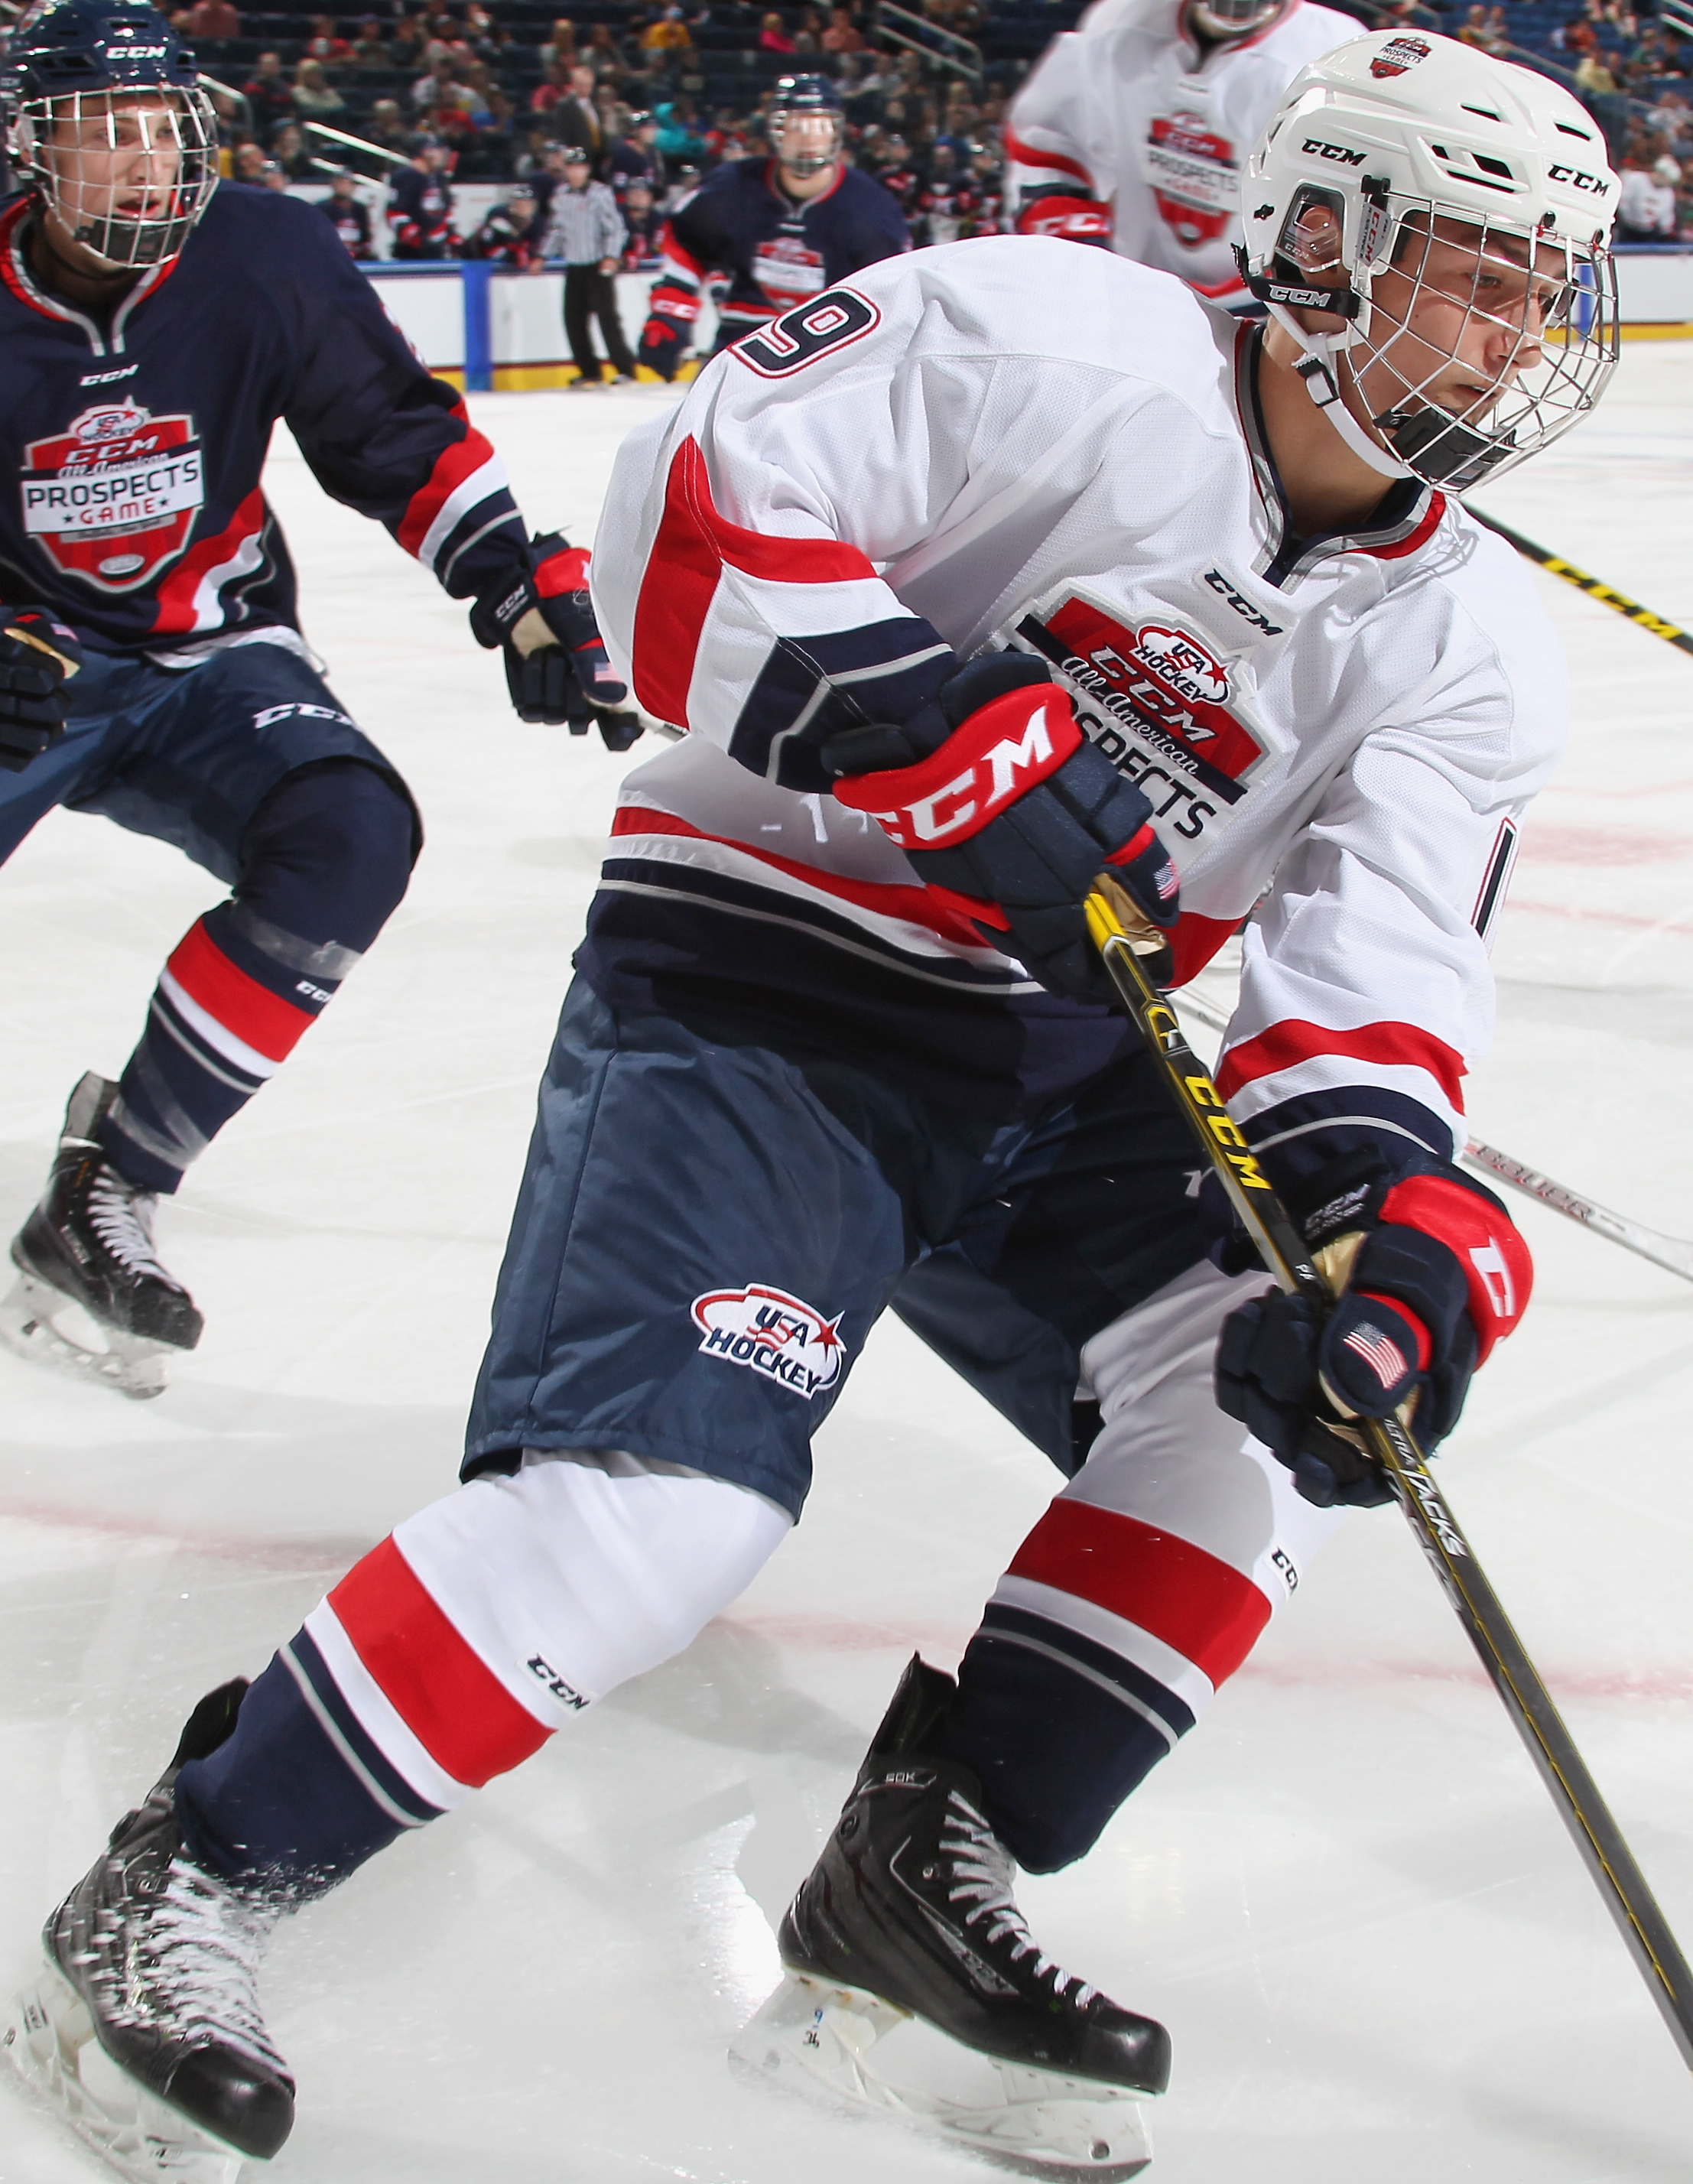 Updated 2016 nhl draft order - Nick Pastujov 2016 Nhl Draft Prospect Profile